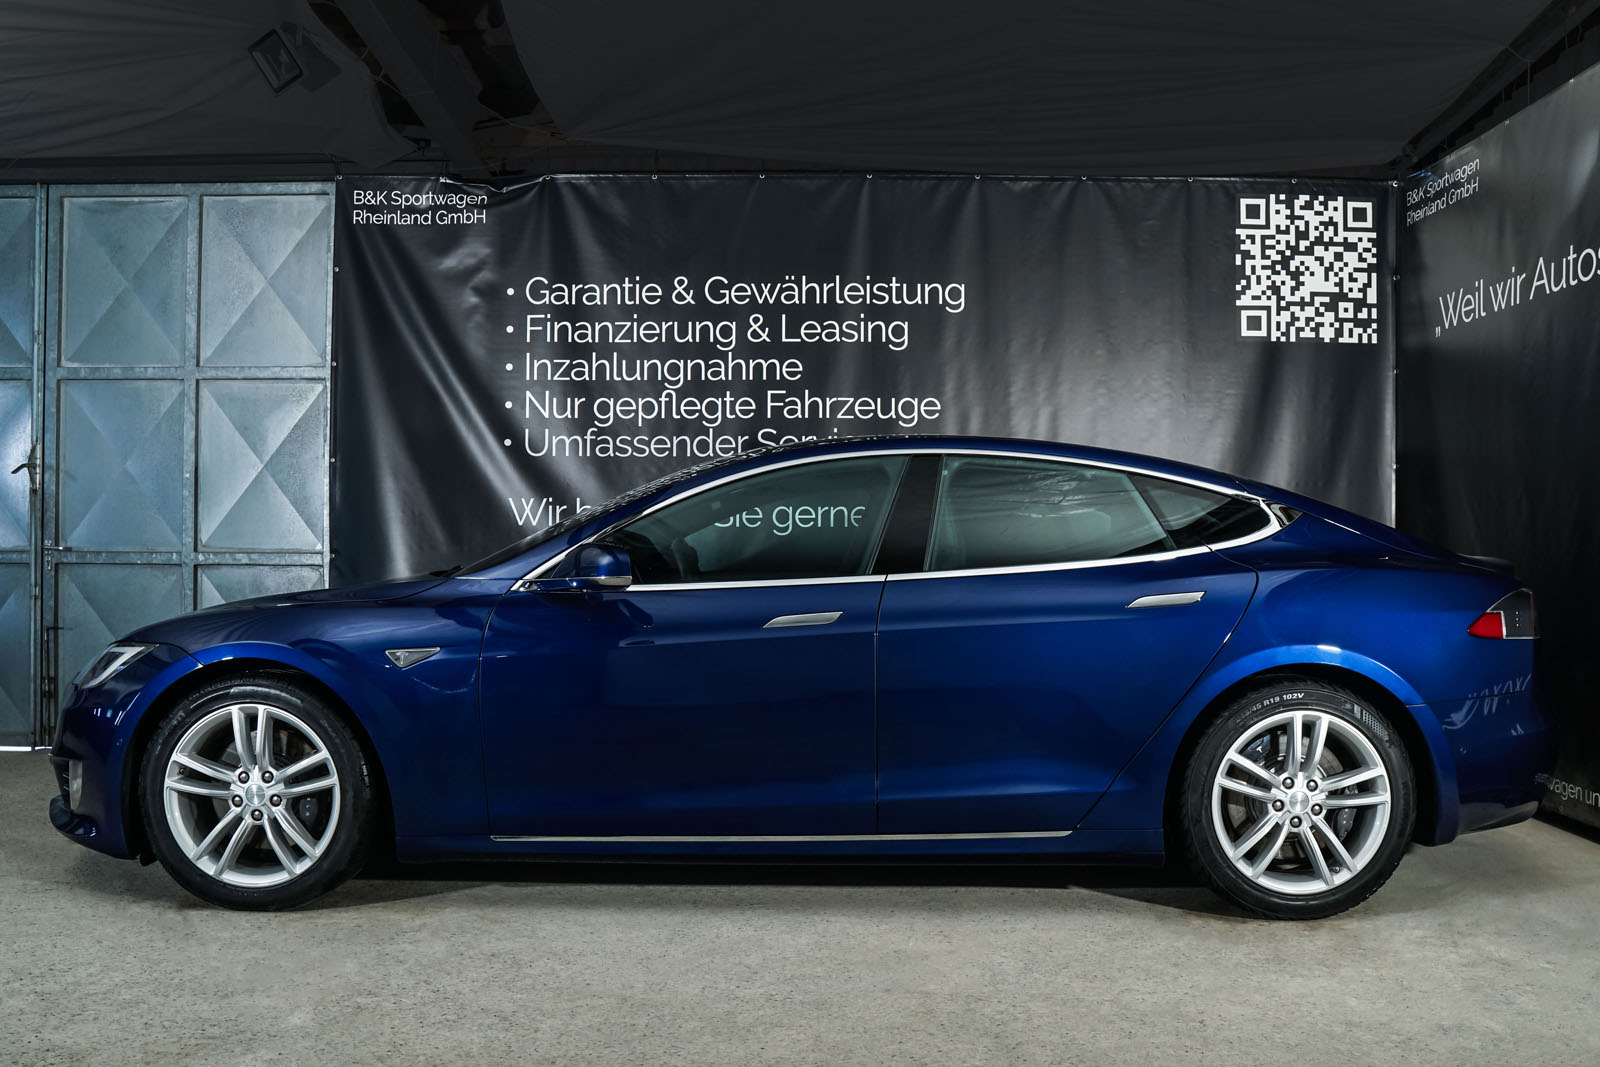 Tesla_ModelS_90D_Blau_Schwarz_Tes-0513_5_w